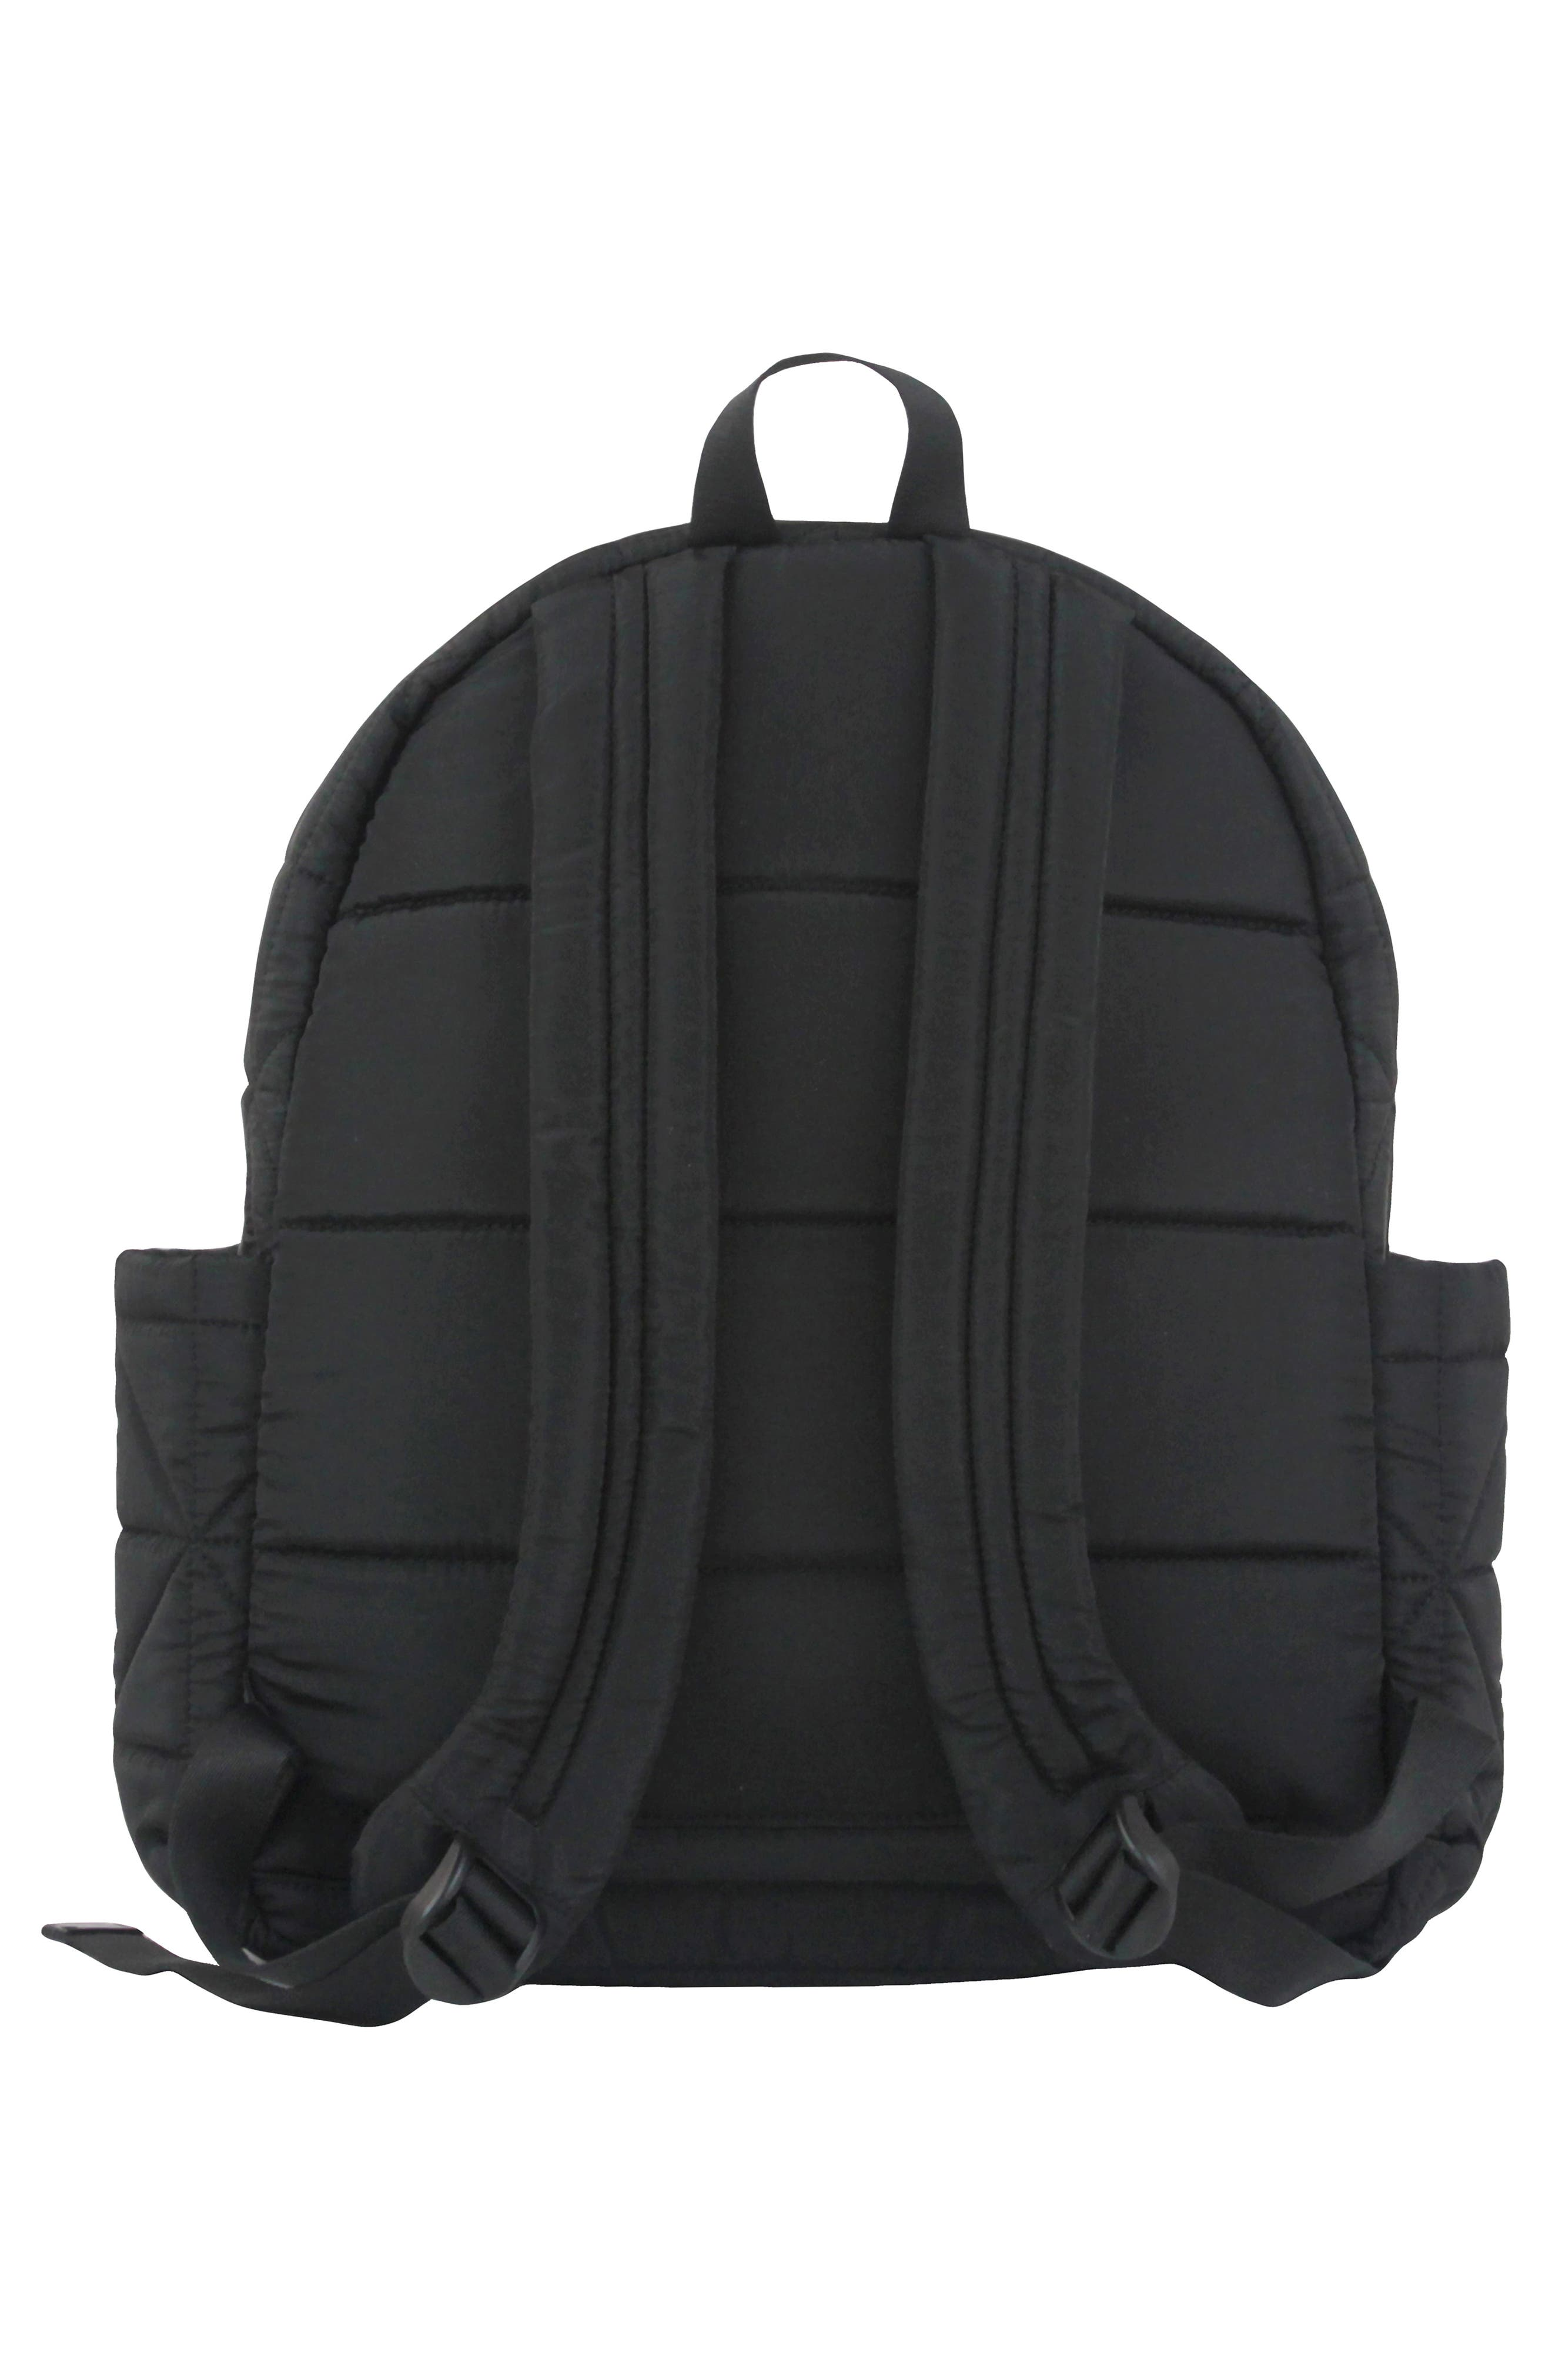 Alternate Image 3  - TWELVElittle Quilted Water Resistant Nylon Diaper Backpack